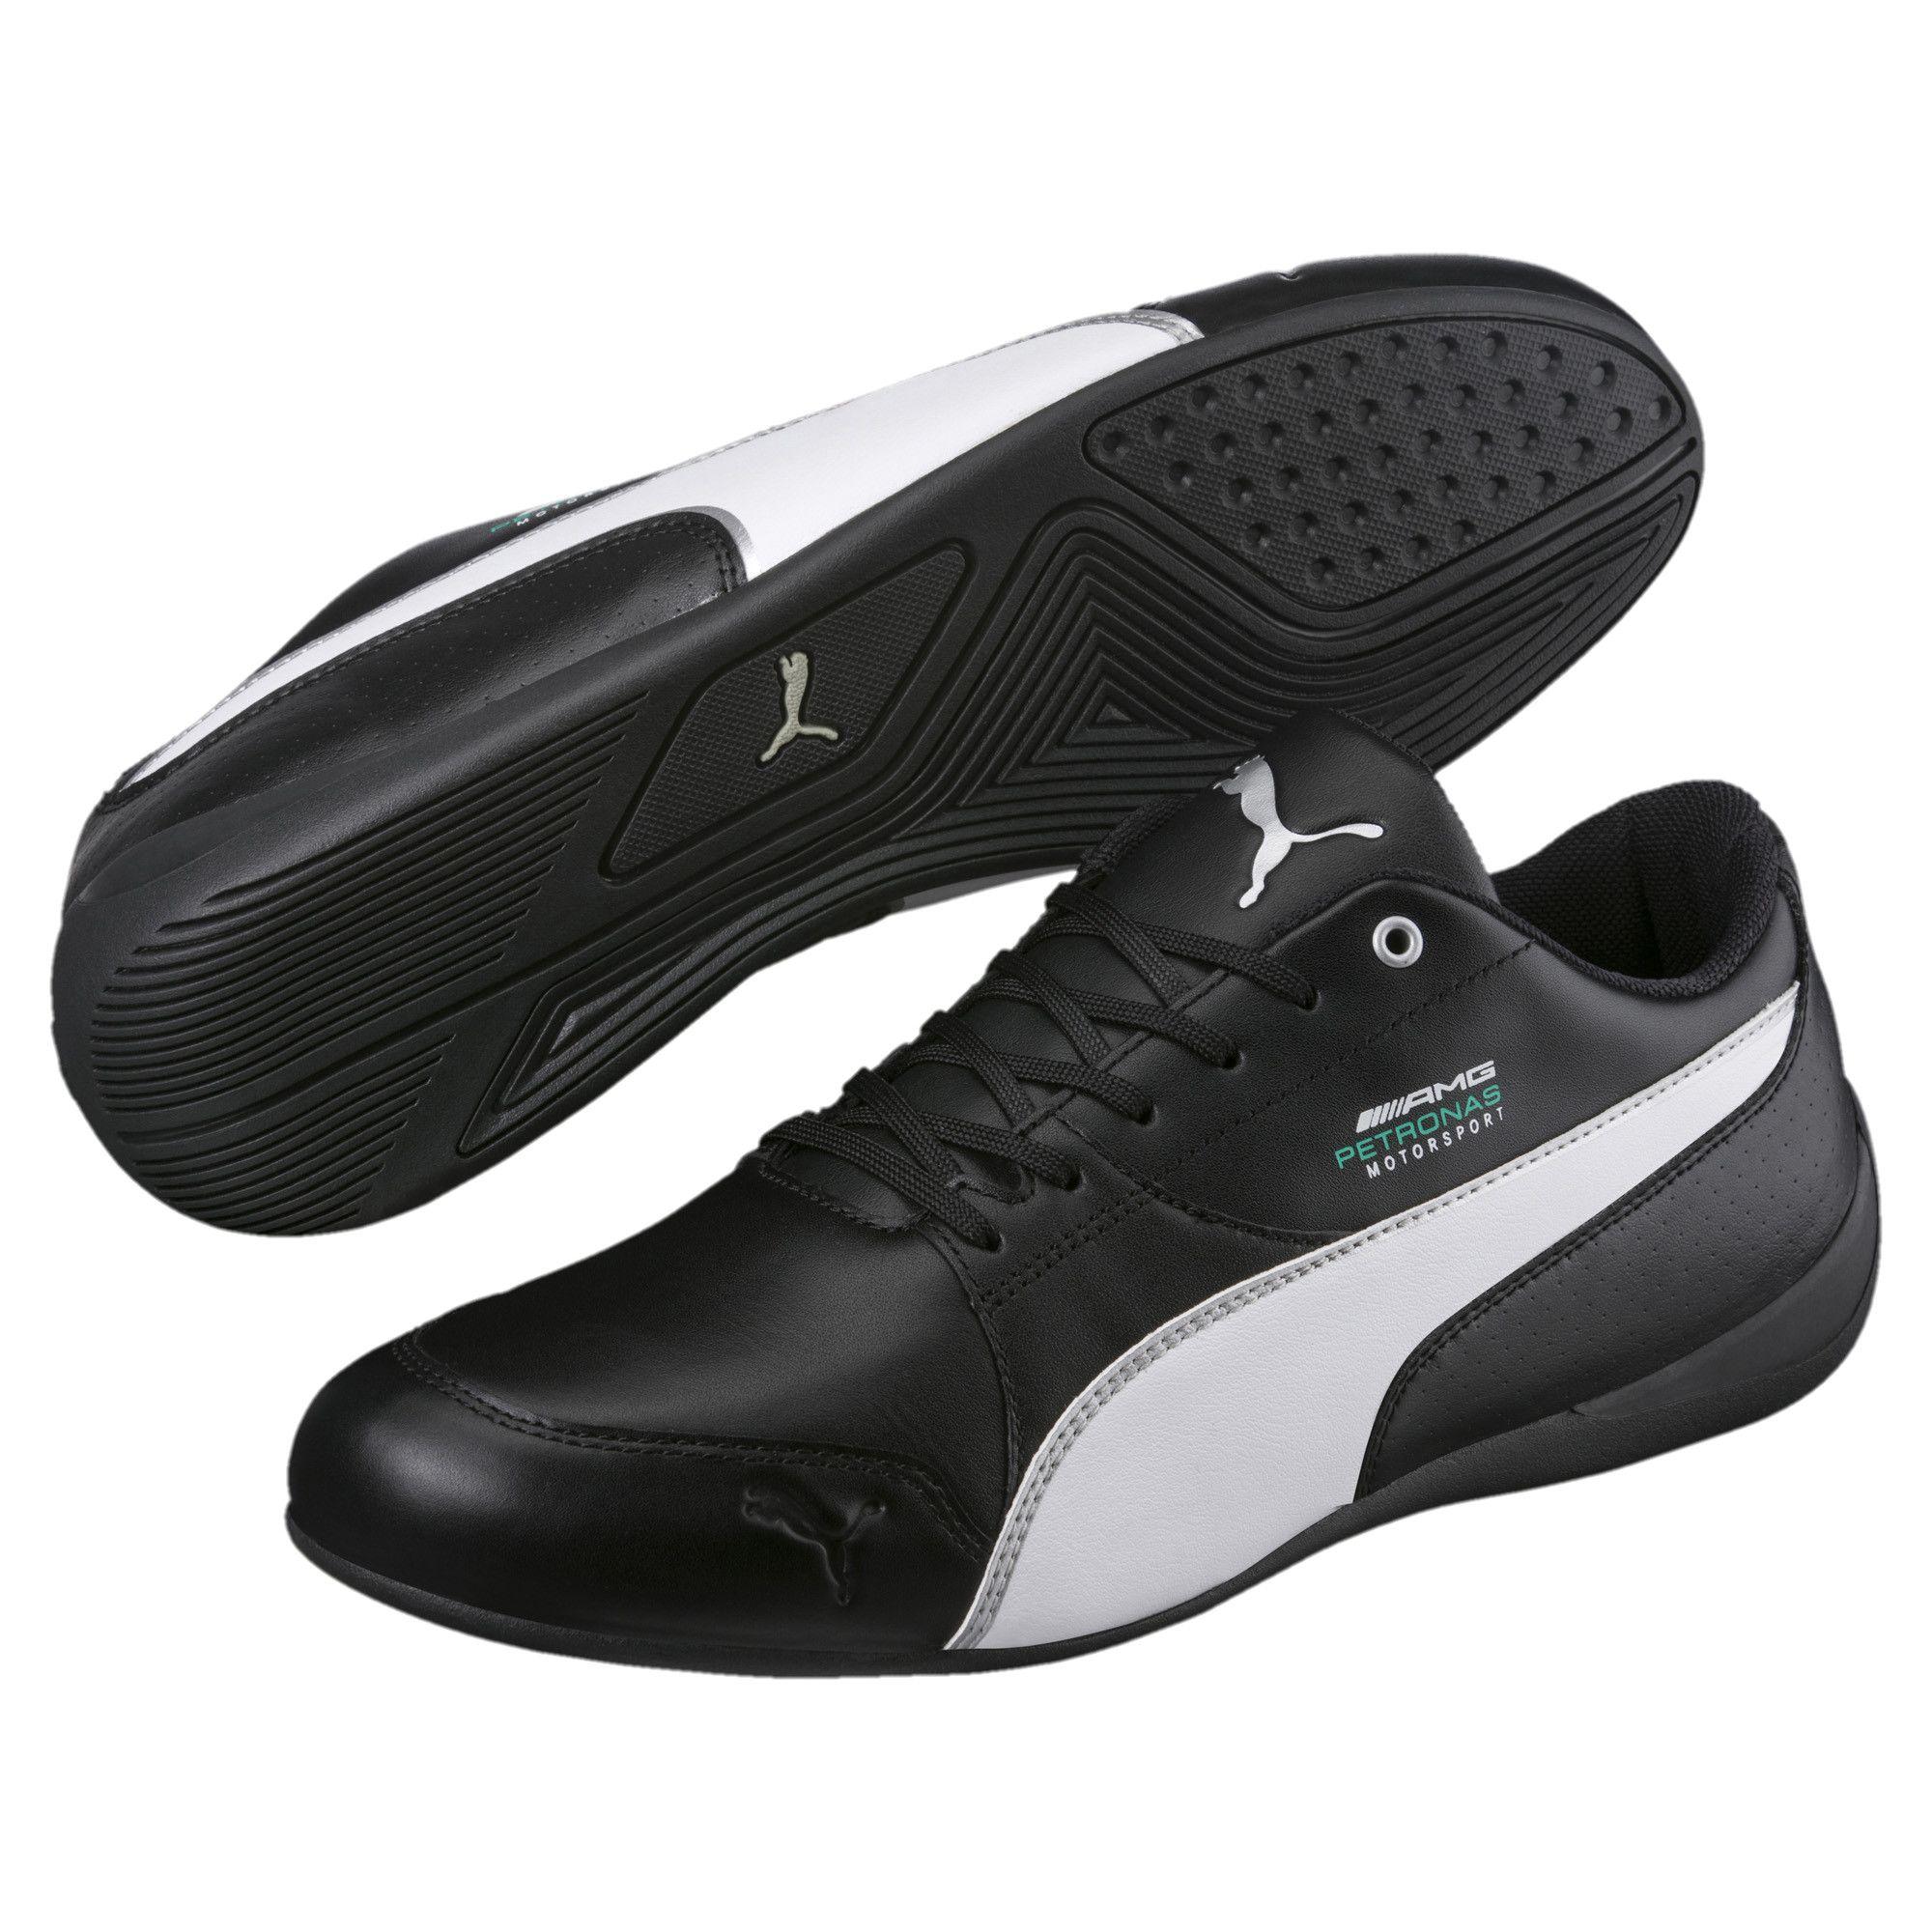 chaussures hommes puma mercedes